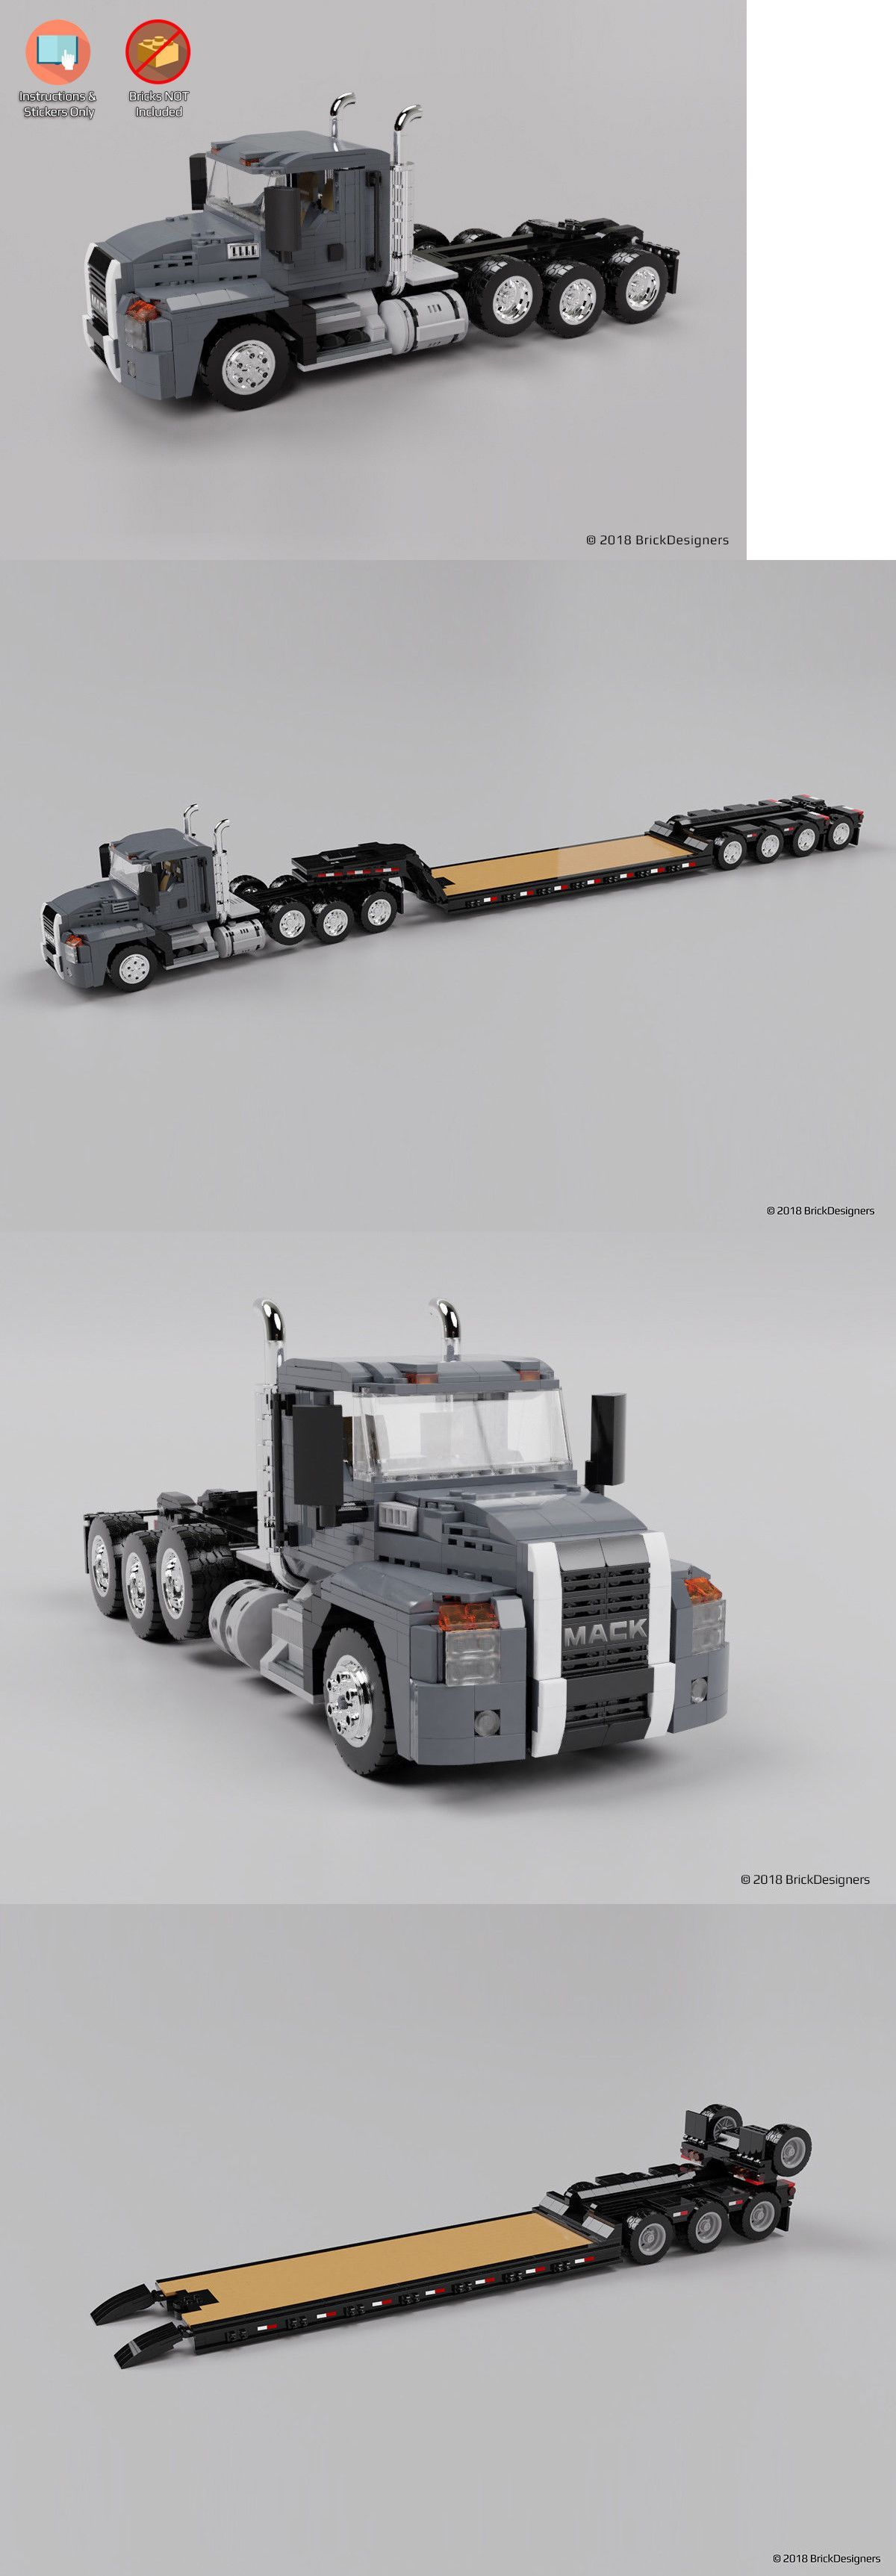 NO BRICKS Instructions /& Stickers to build a custom Lego Scania S Truck